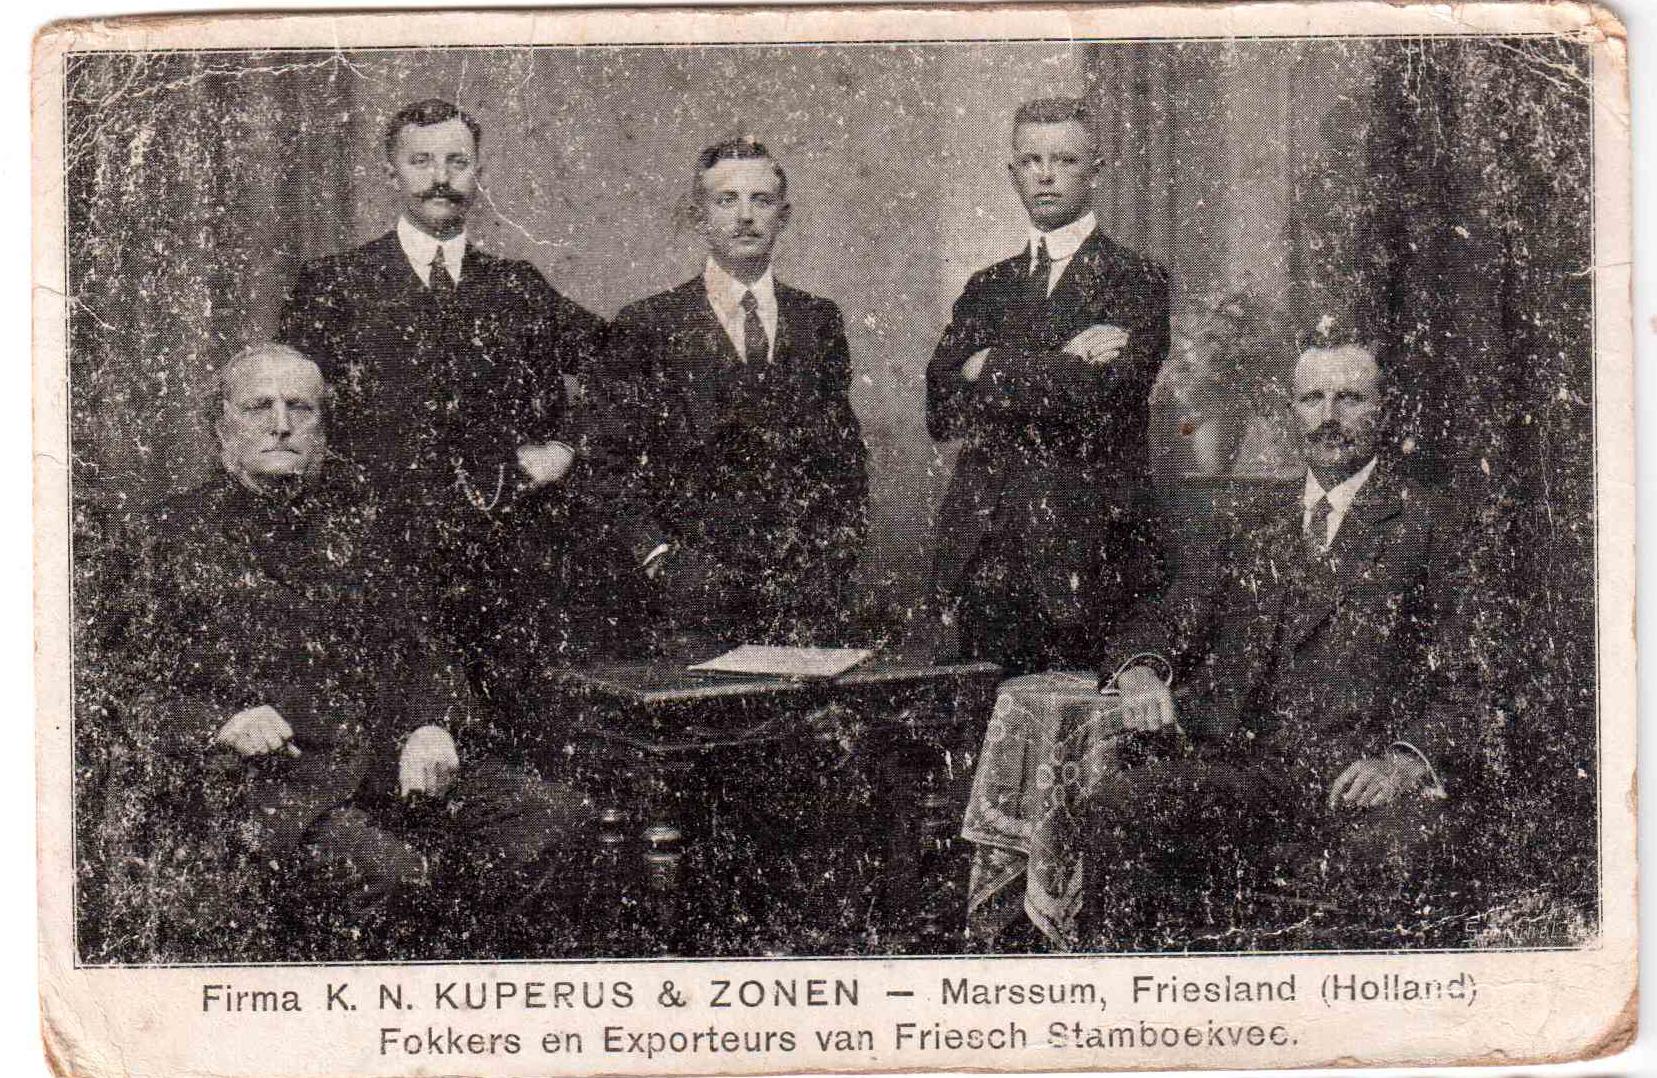 kuperus-firma-kaart